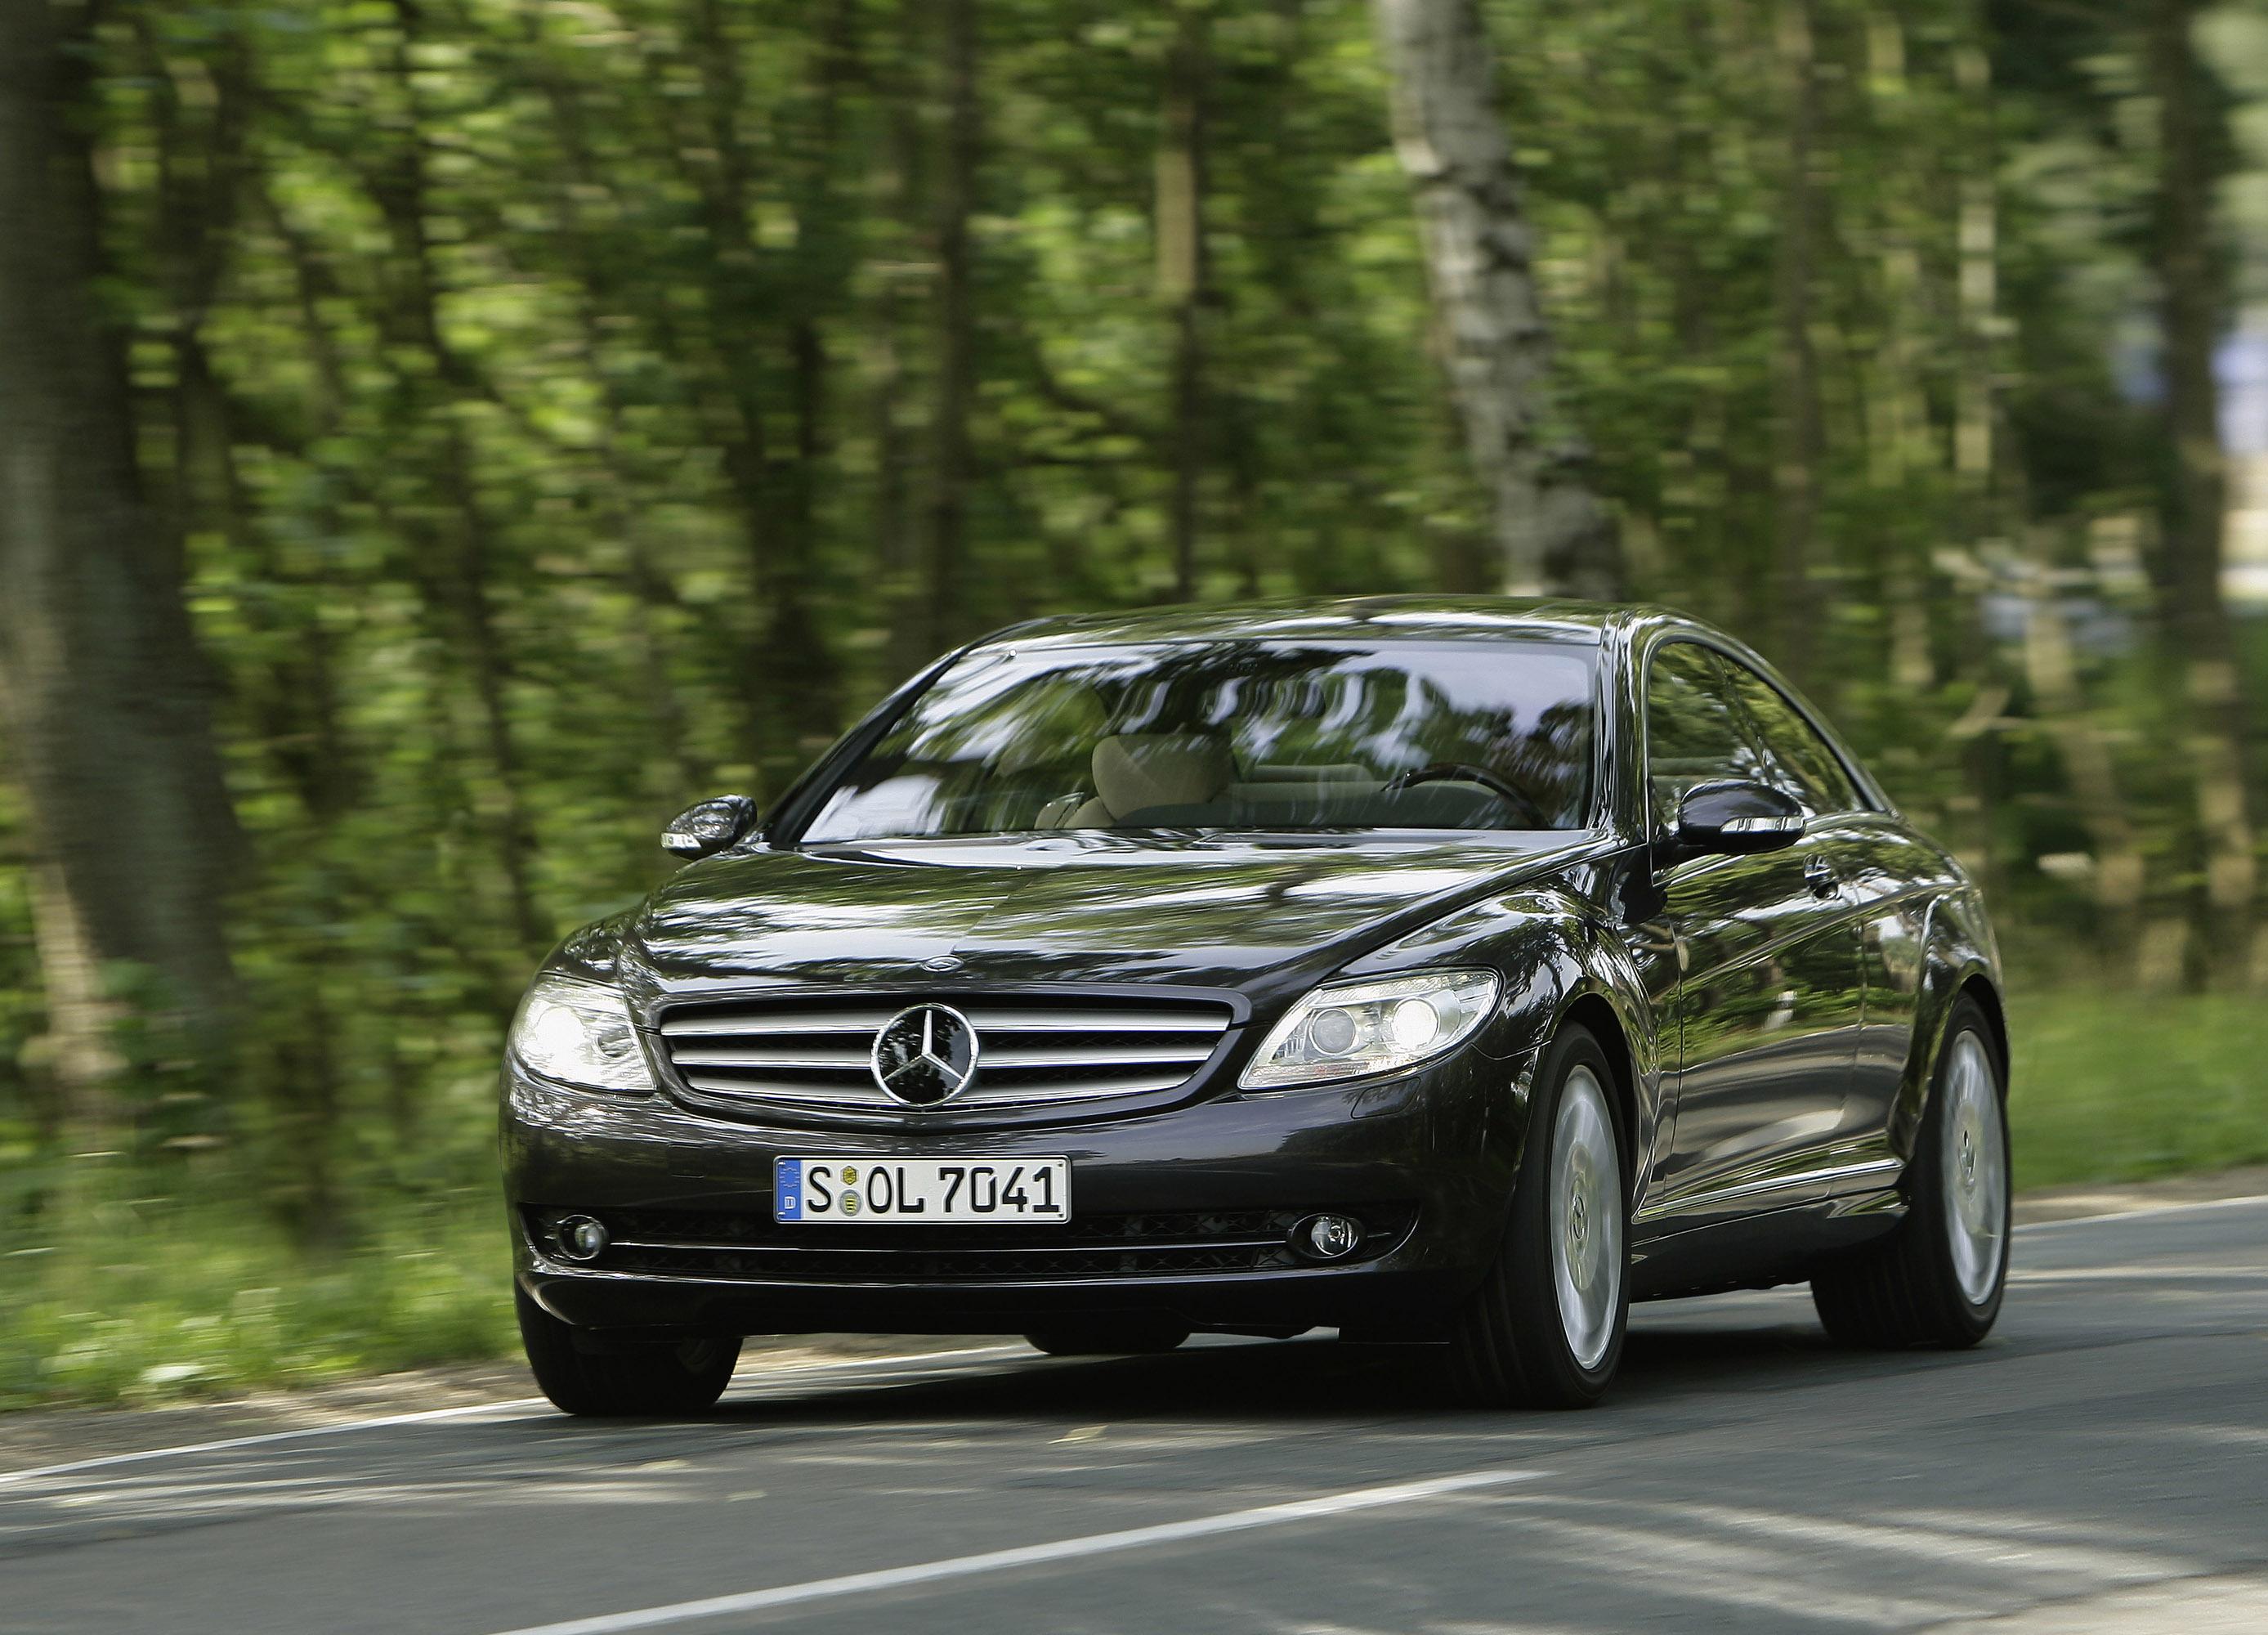 Mercedes cl500 review 2007 auto cars for Mercedes benz cl500 review